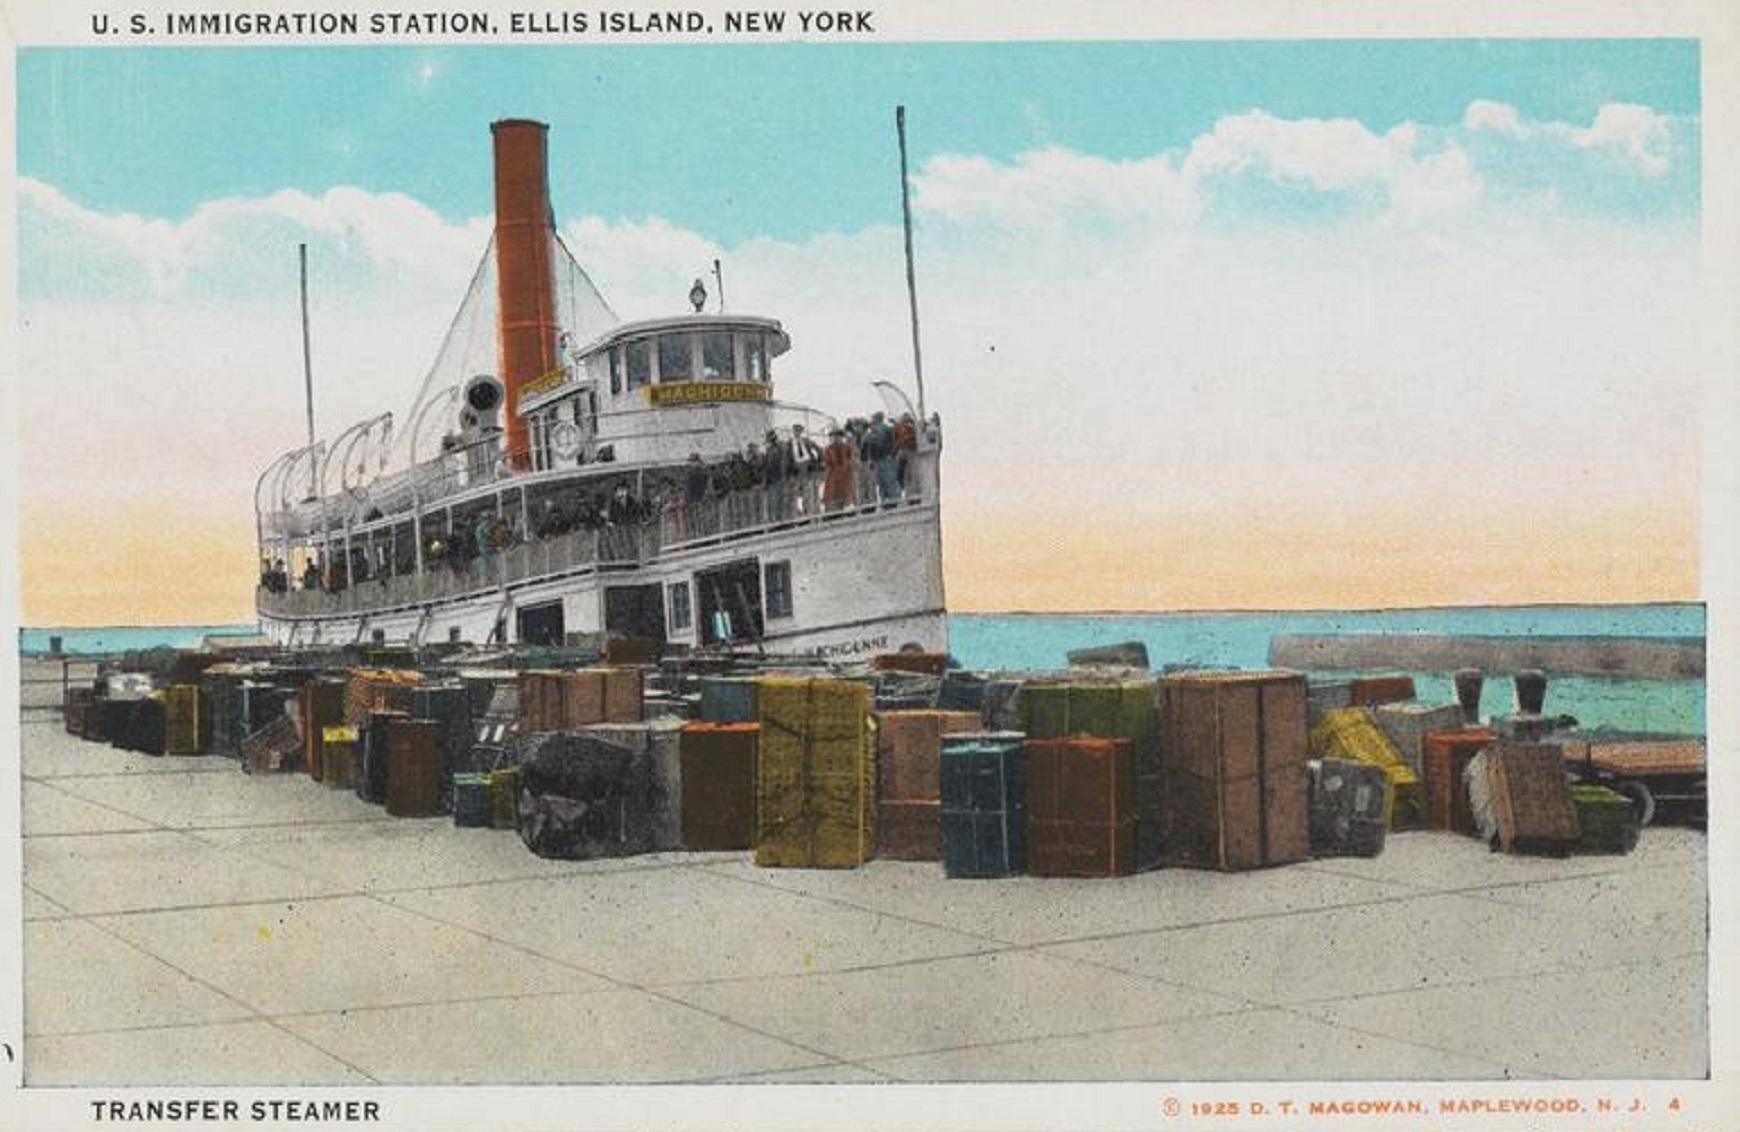 Postcard of U.S. Immigration Station, Ellis Island, New York. Transfer Steamer.